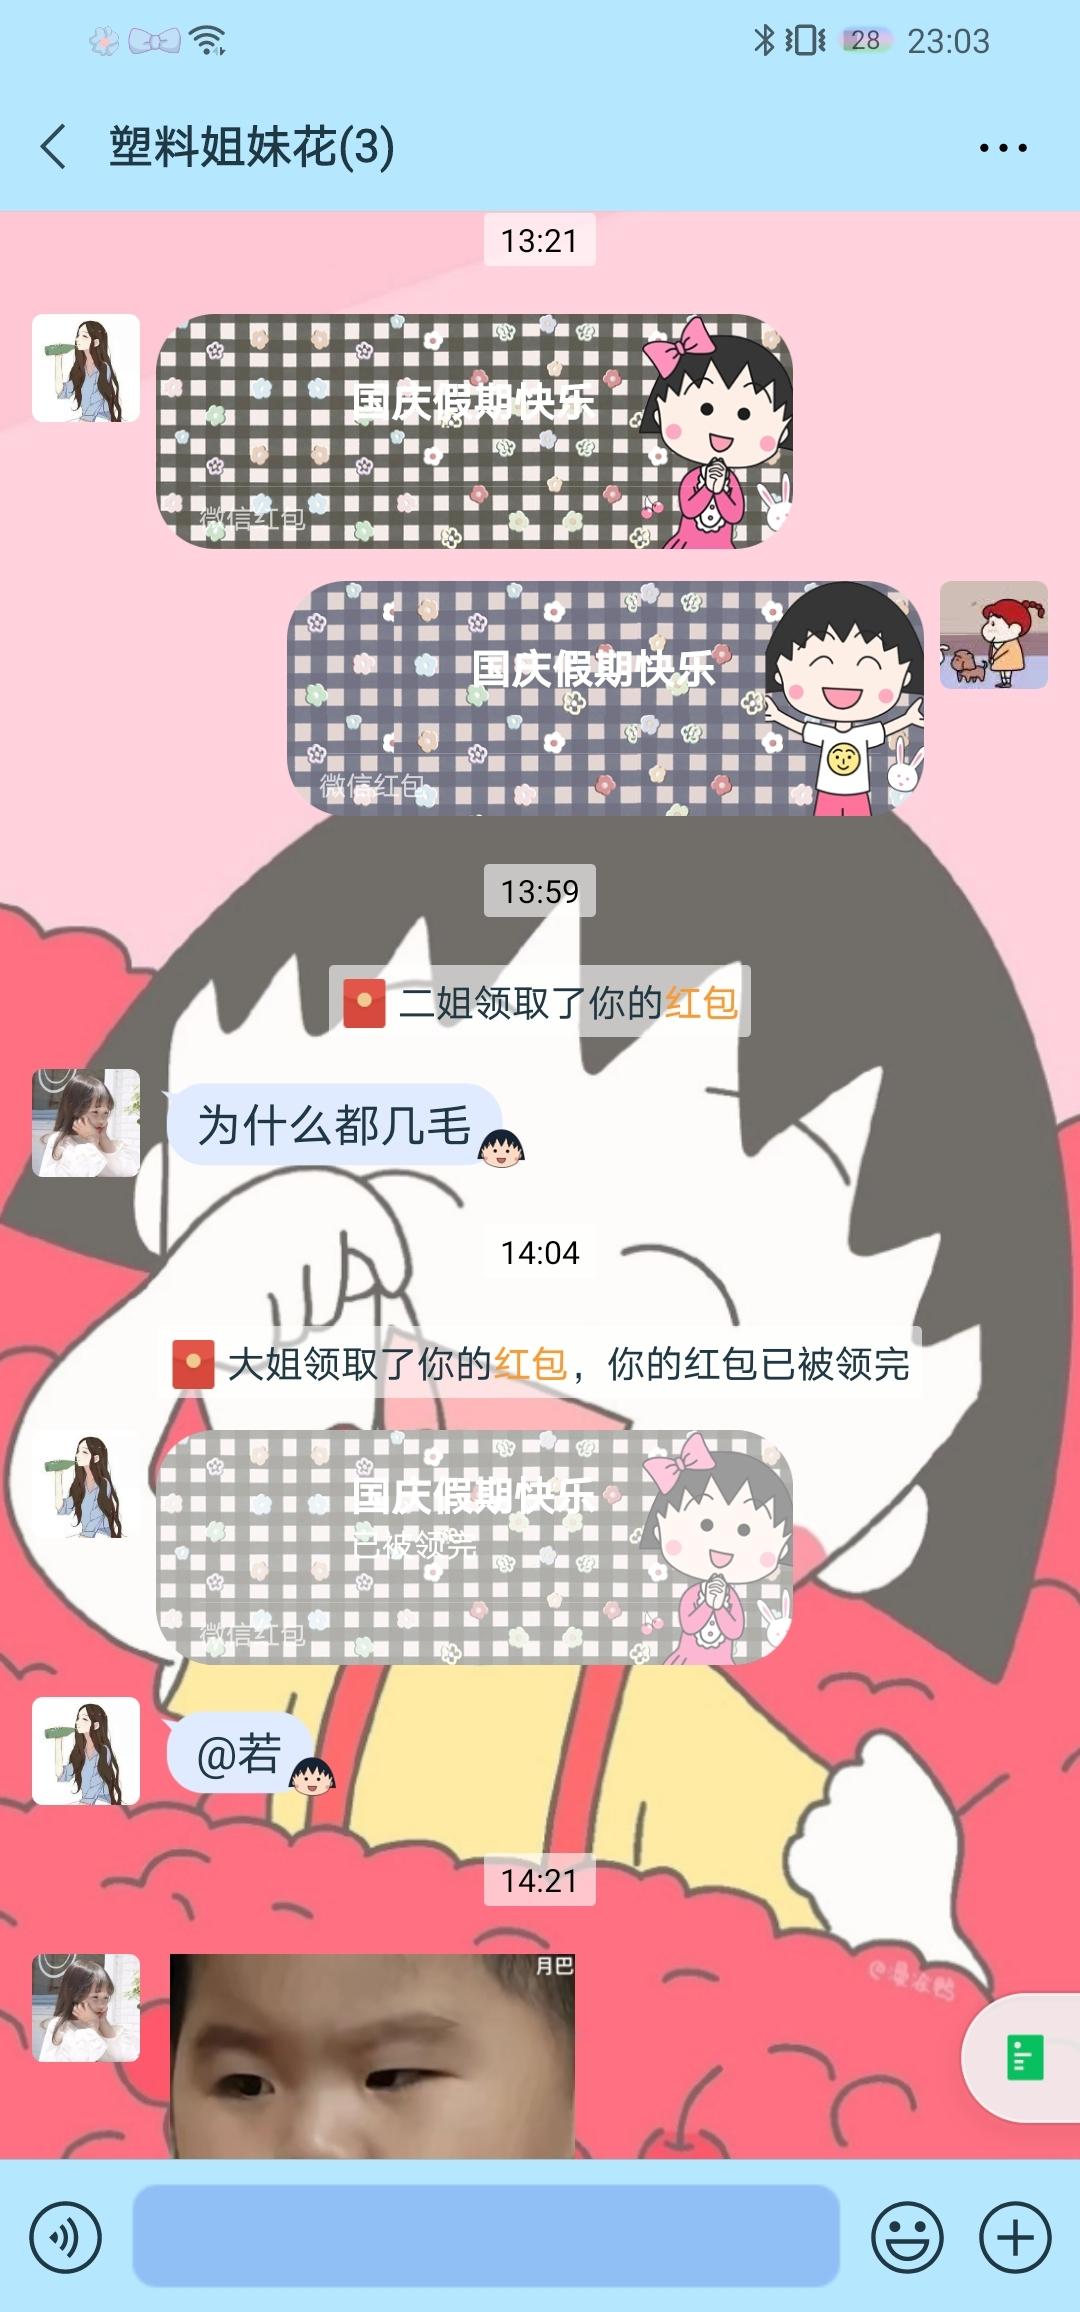 Screenshot_20201005_230303_com.tencent.mm.jpg